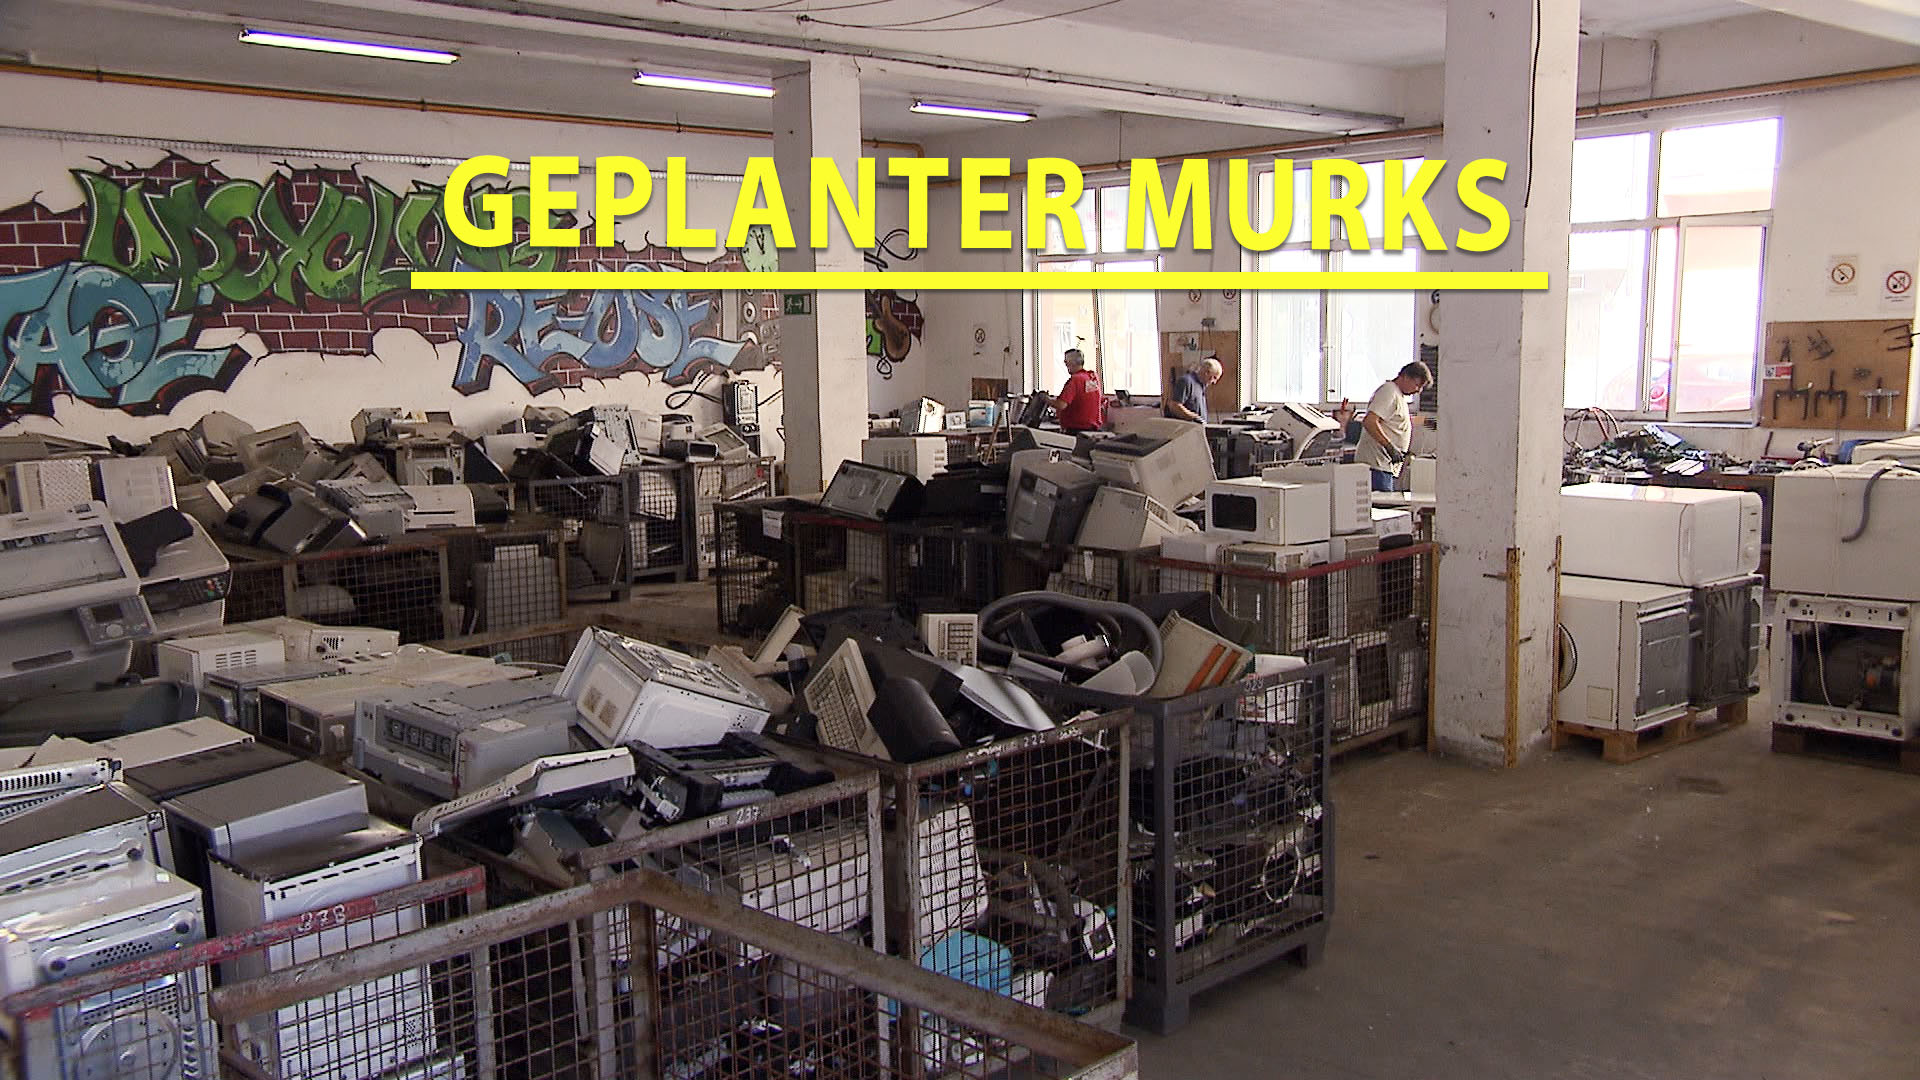 Geplanter Murks